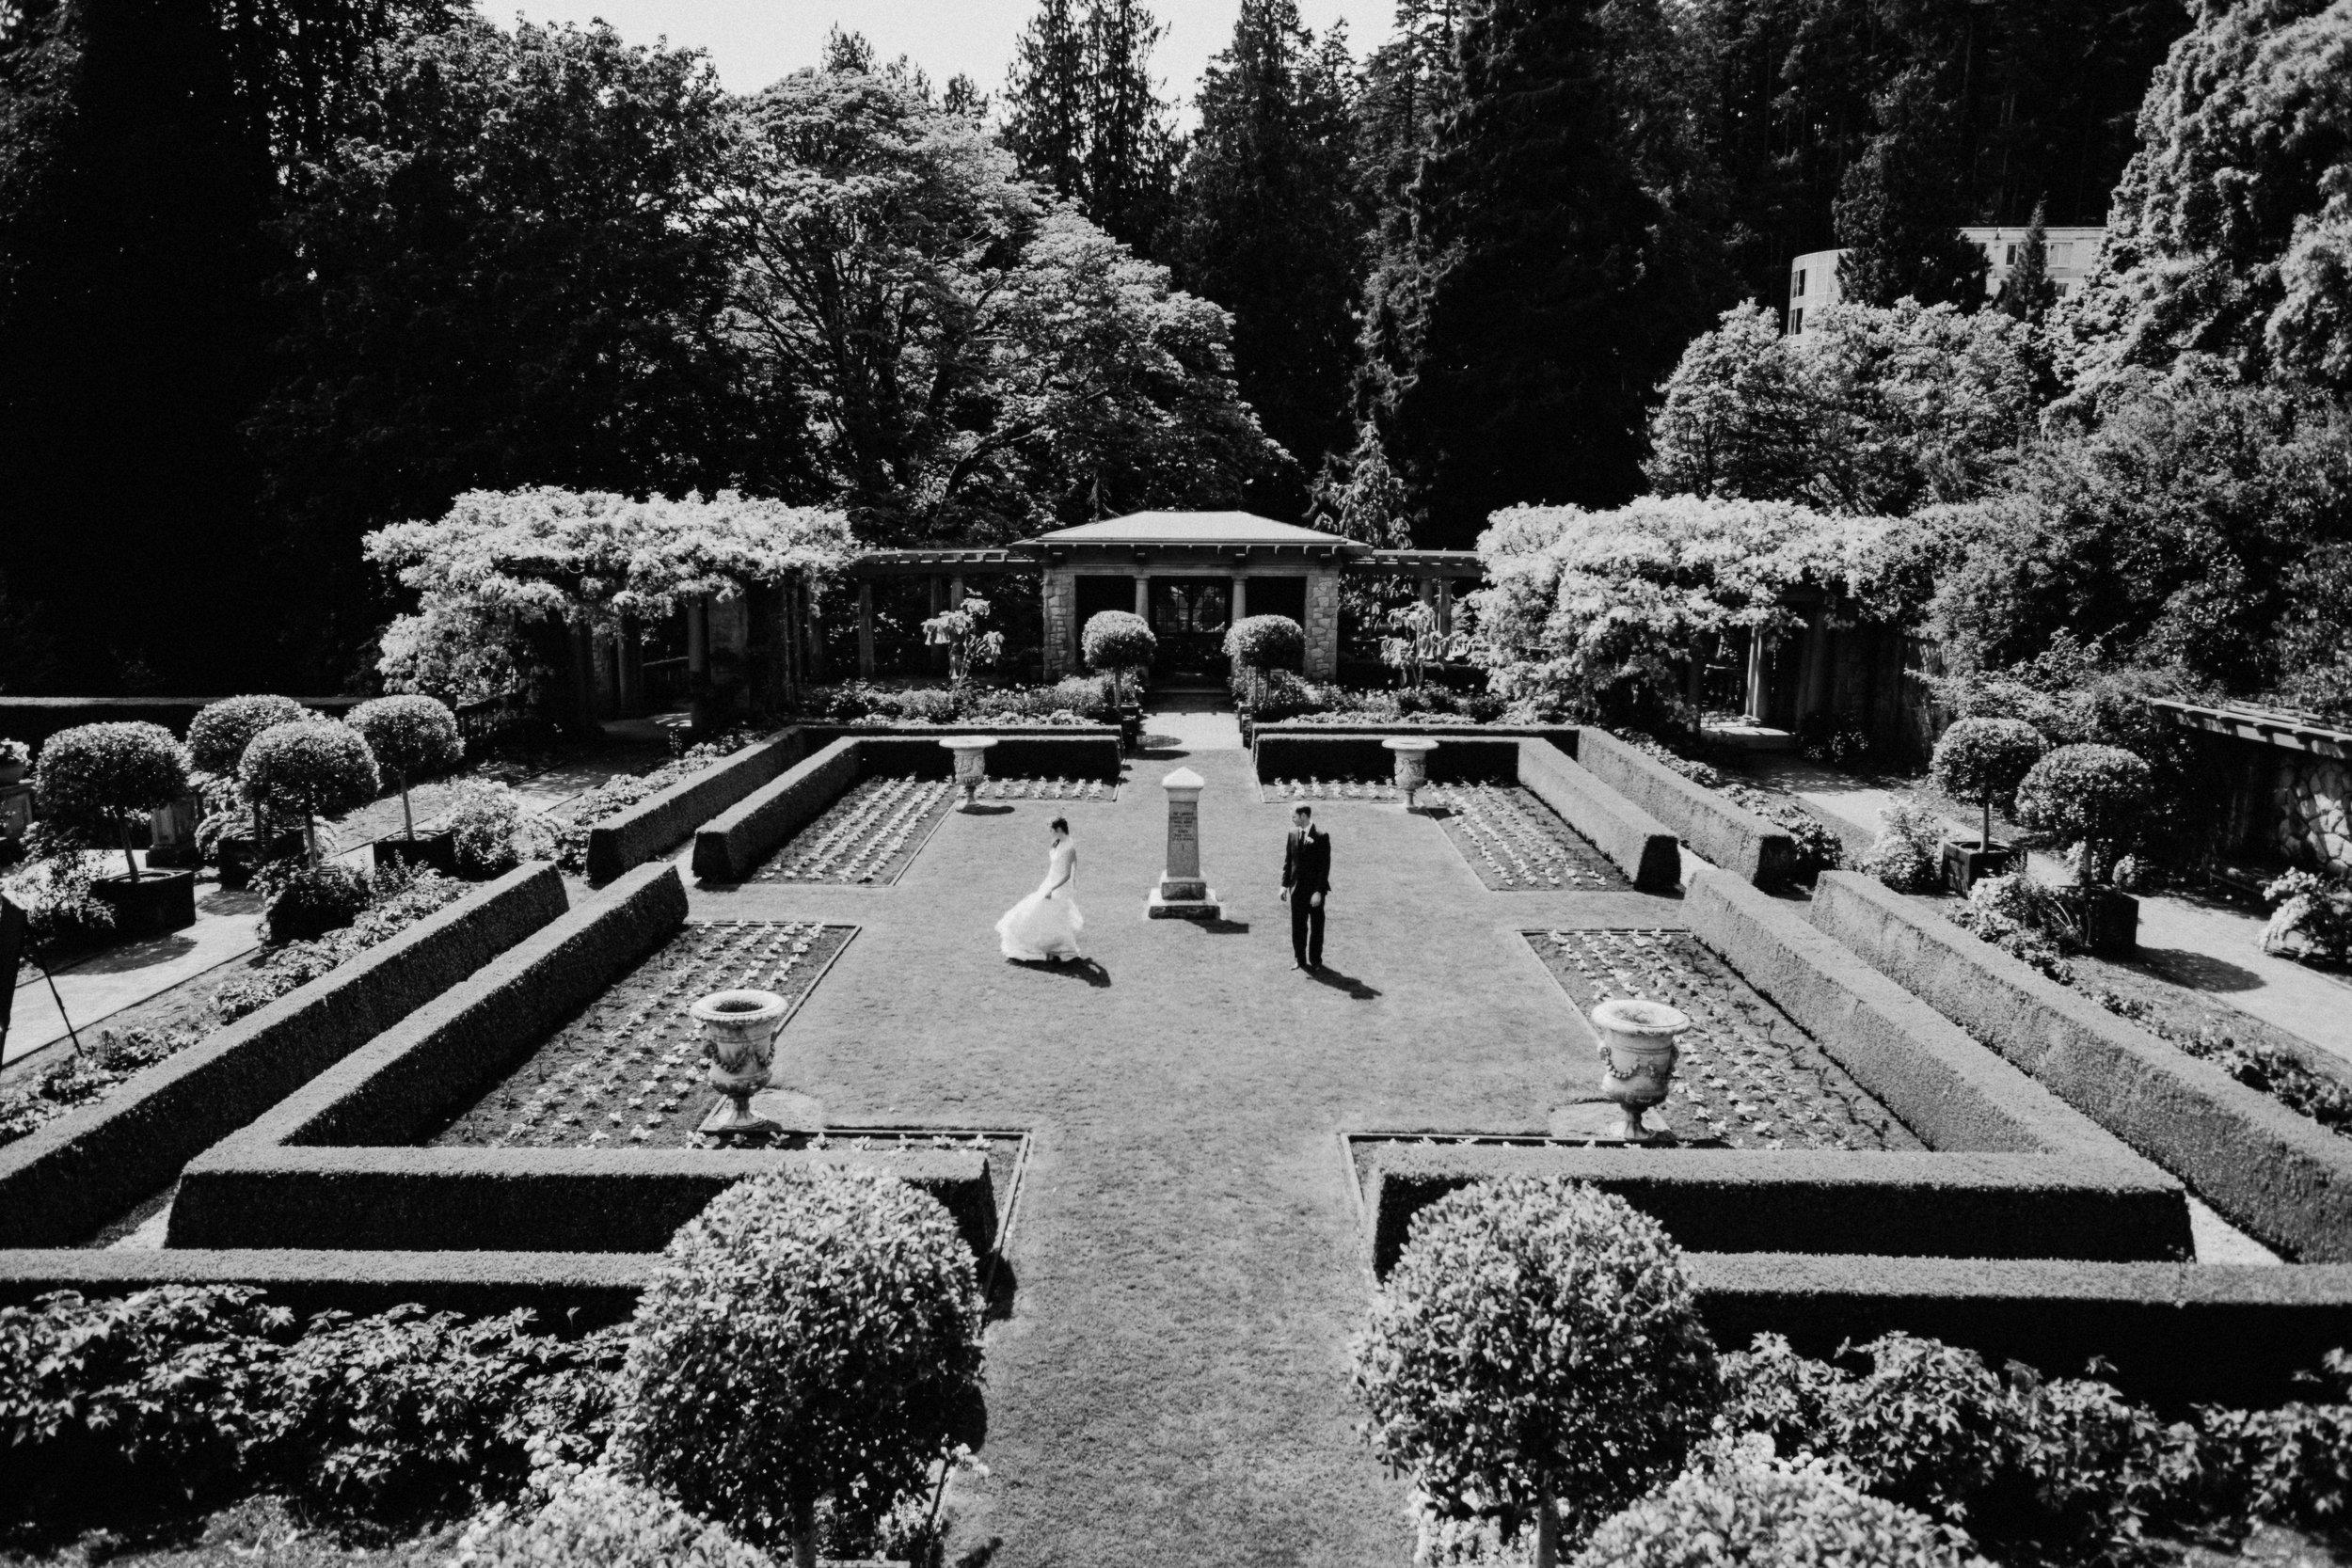 hatley-castle-wedding-photos-0050.jpg